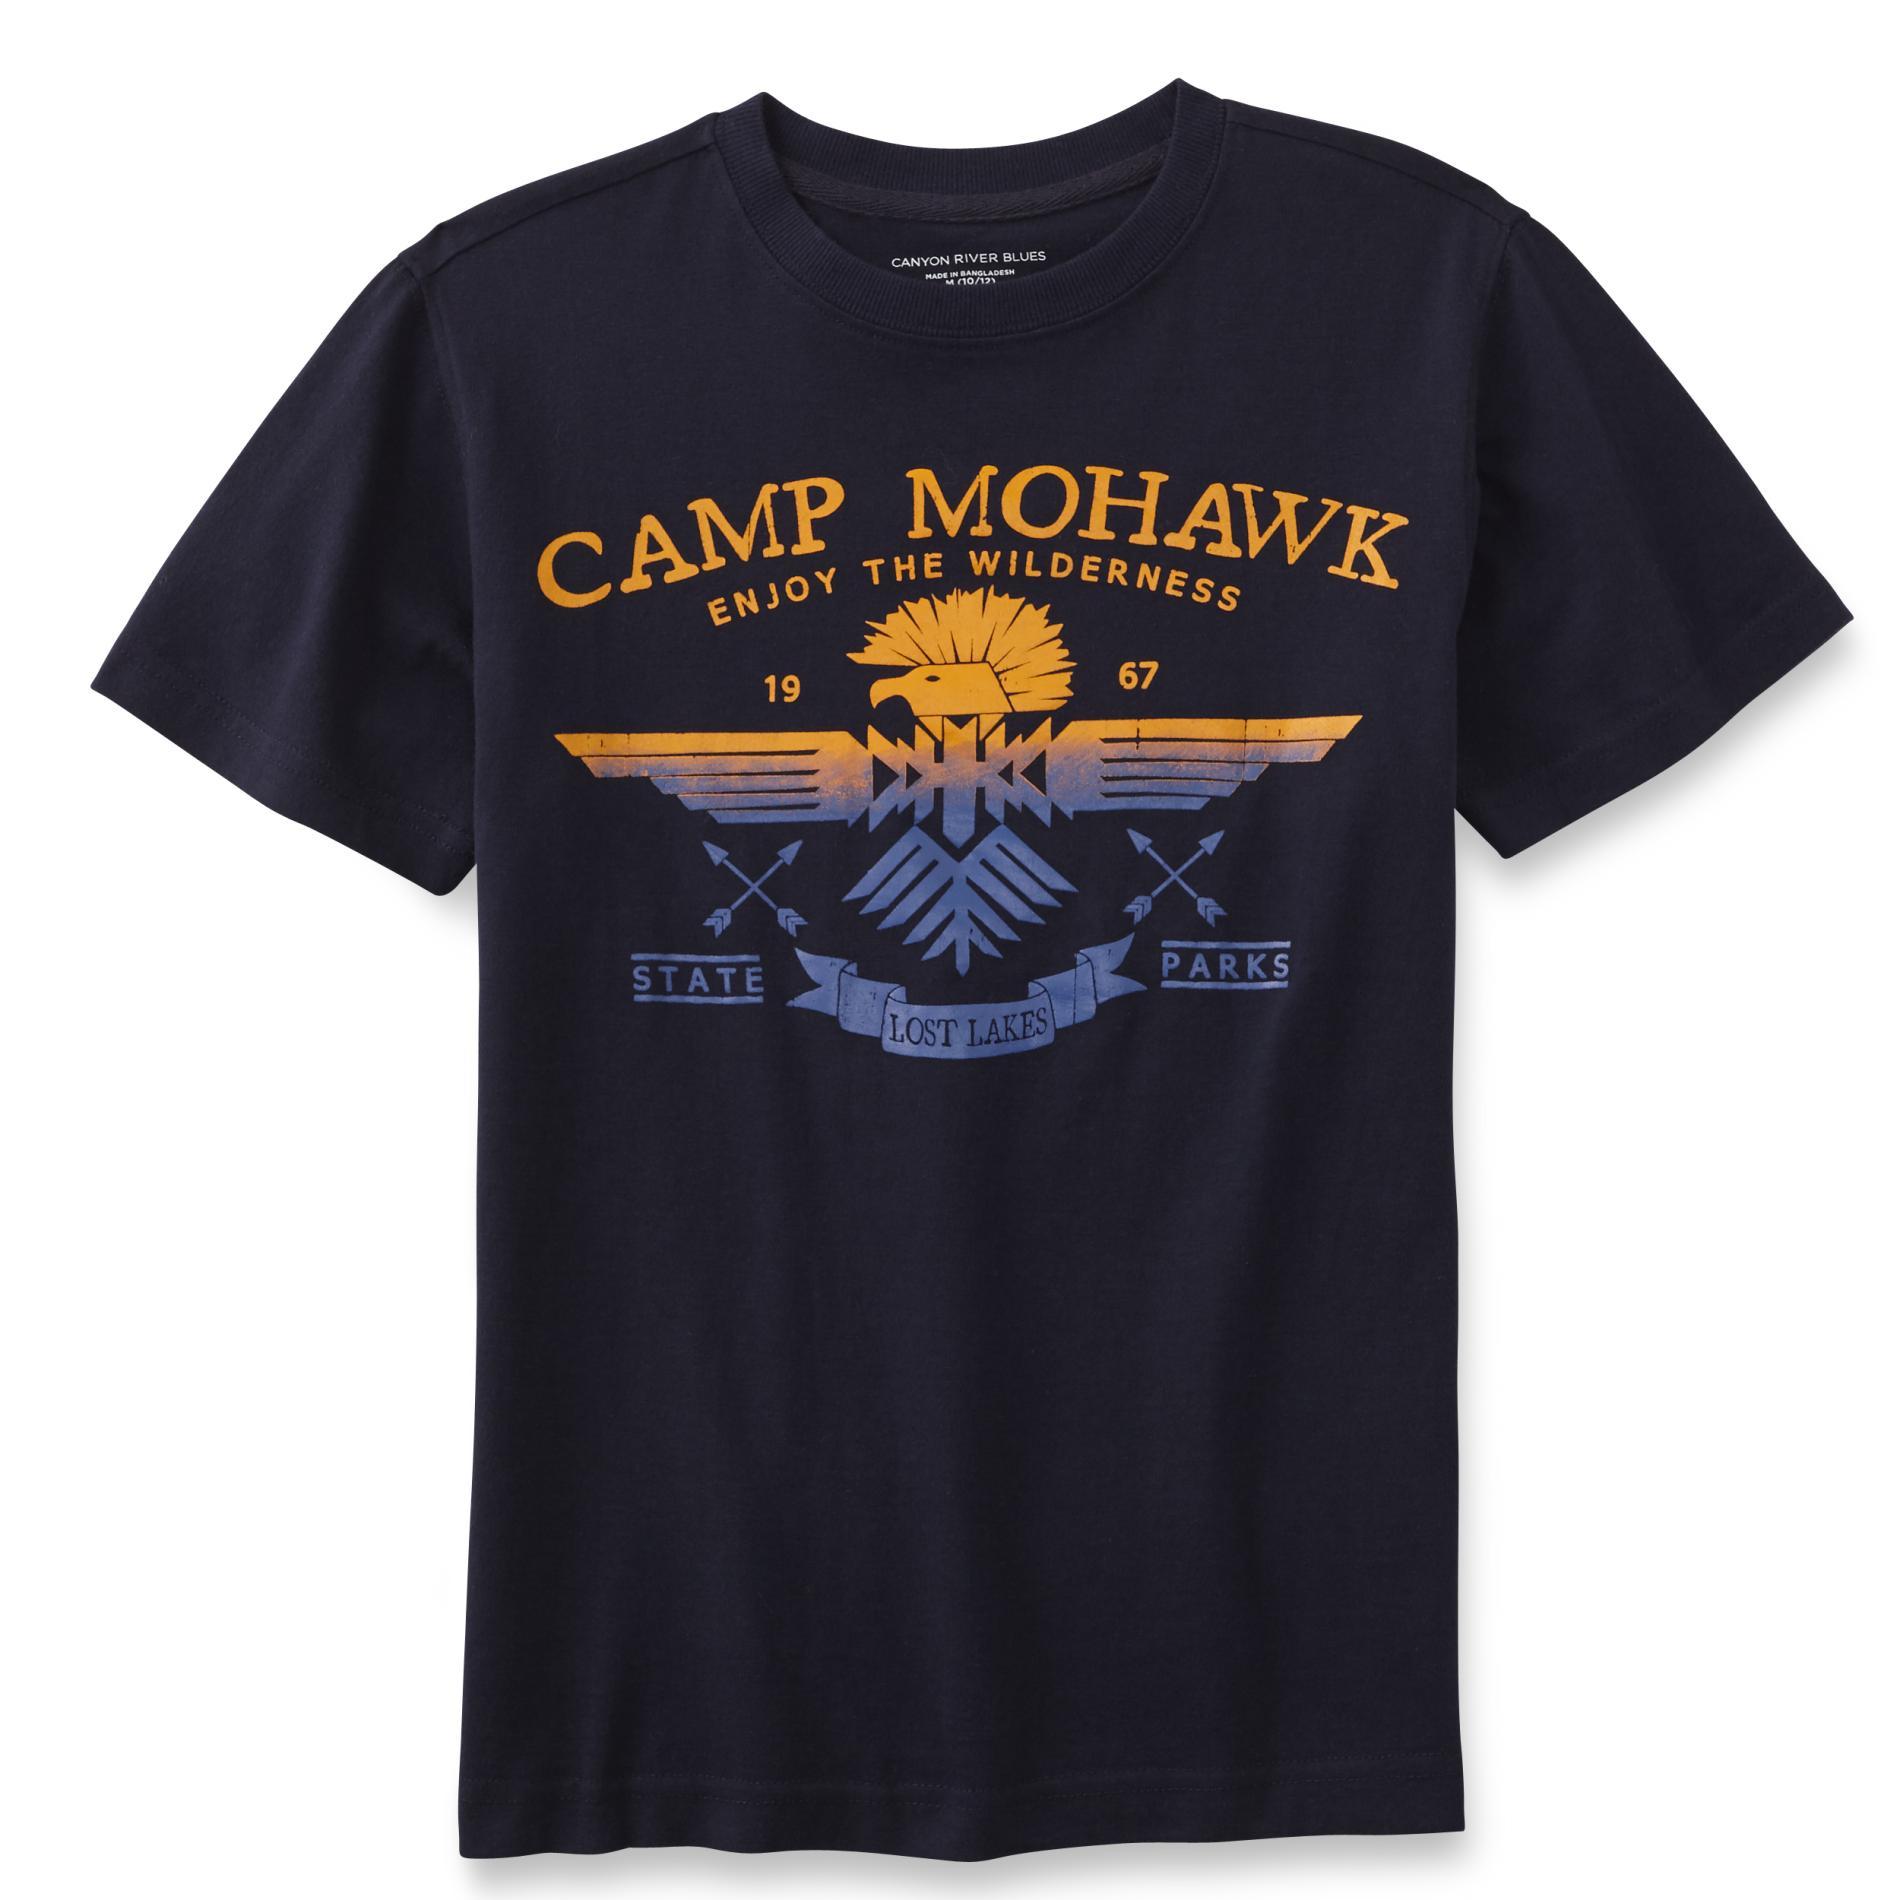 Canyon River Blues Boy's Graphic T-Shirt - Camp Mohawk